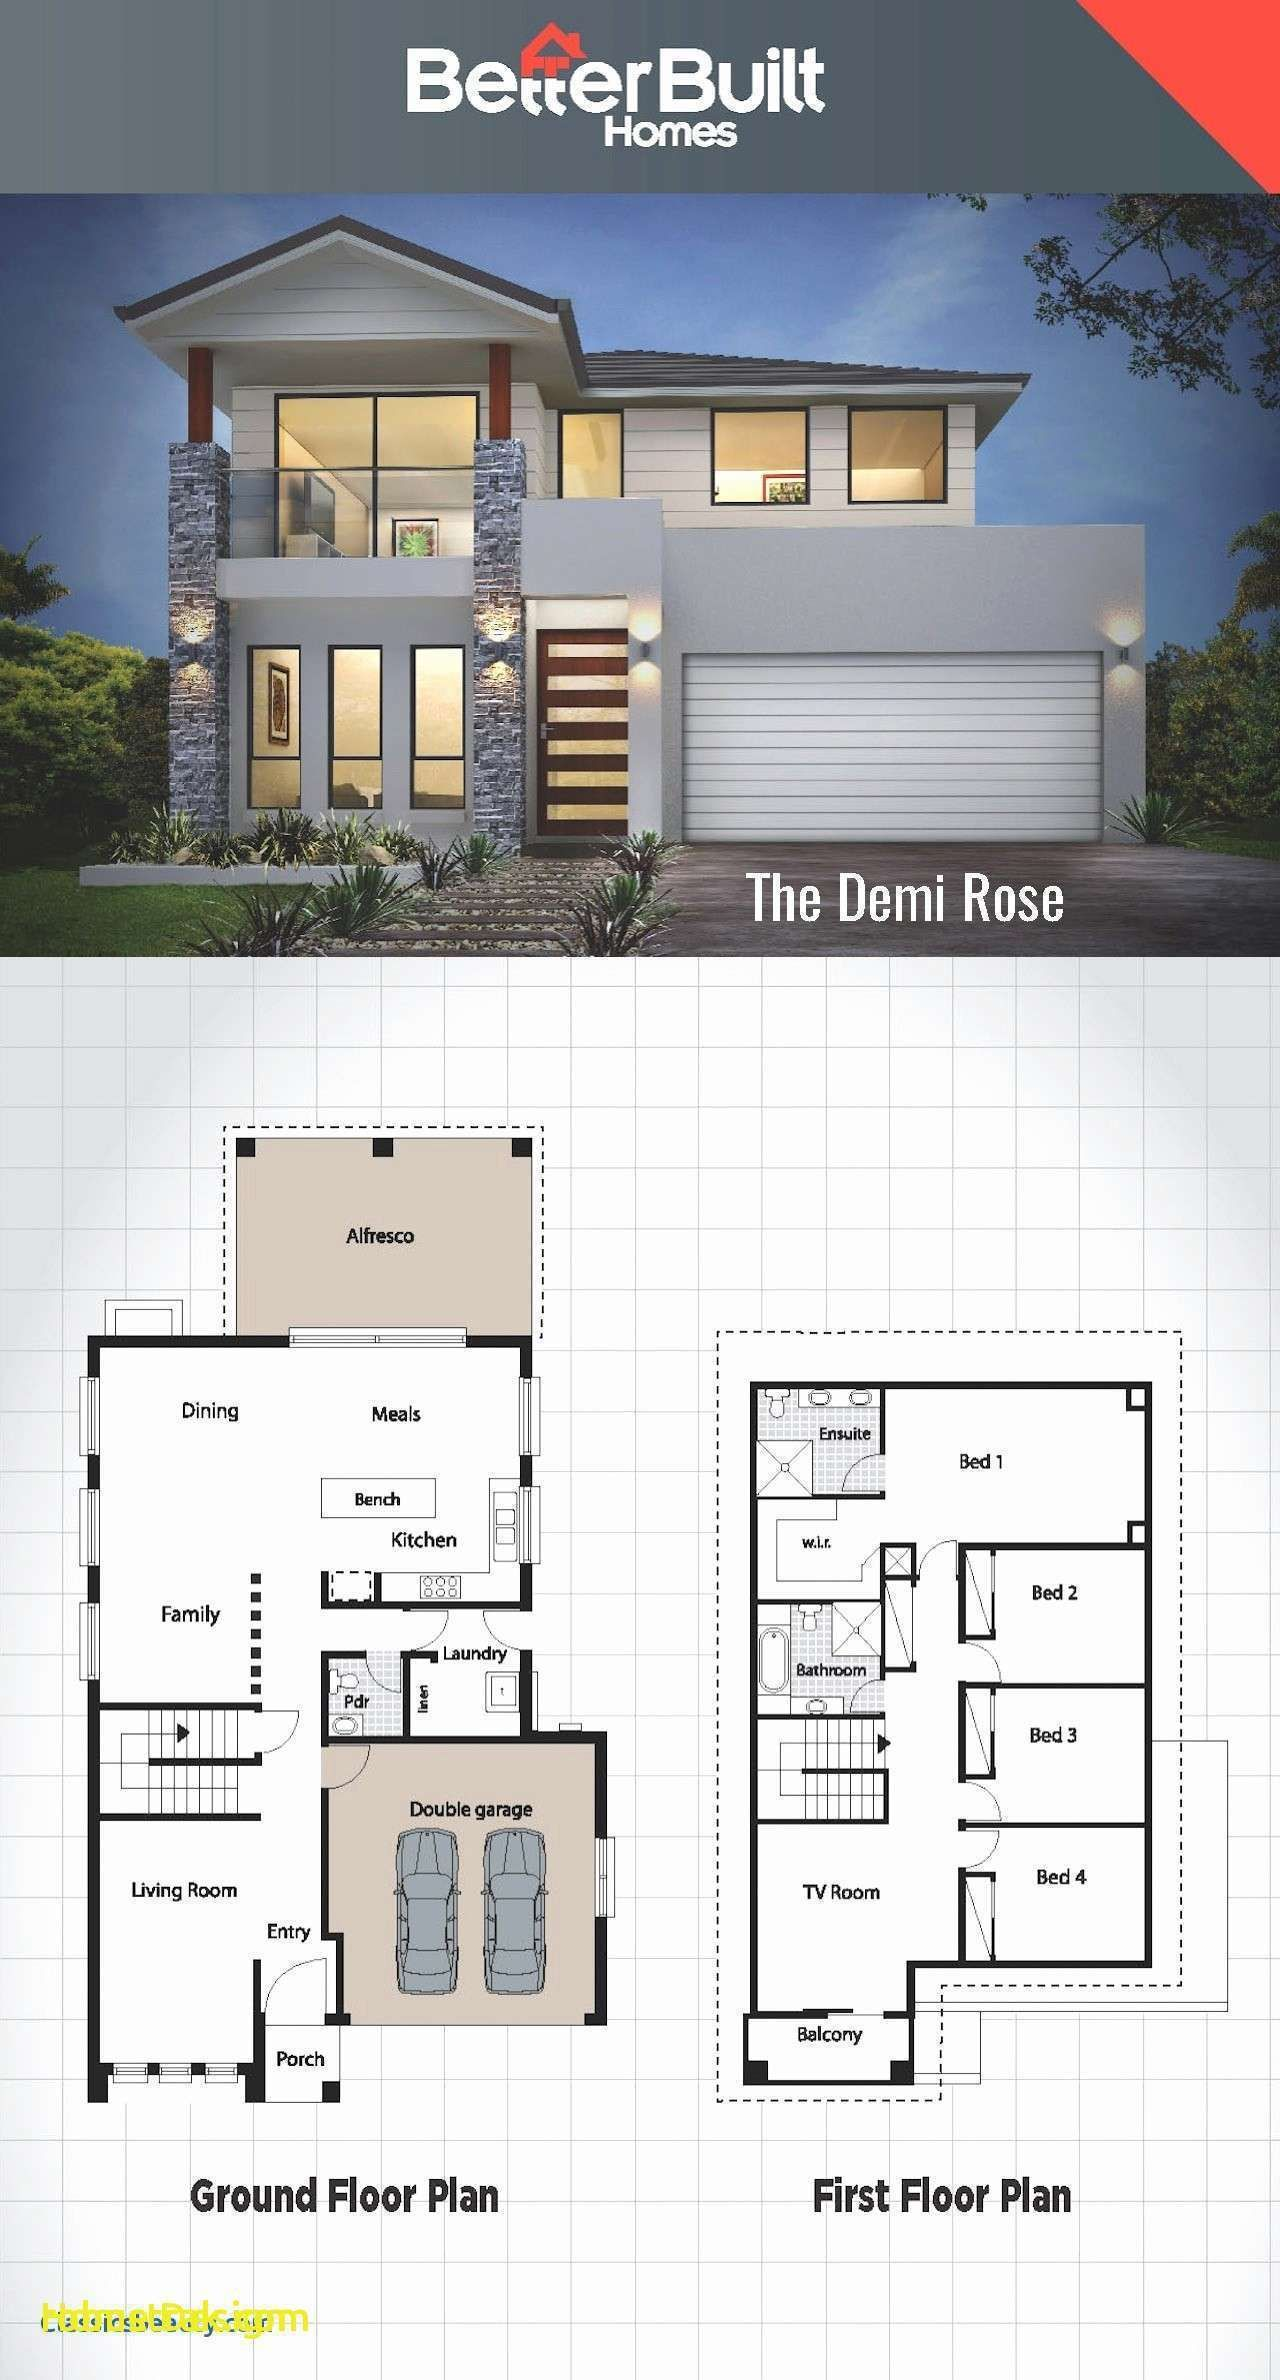 29 Barndominium Floor Plans Ideas To Suit Your Budget Barndominiumfloorplans Barndominiumide House Plans Australia 4 Bedroom House Plans Bedroom House Plans